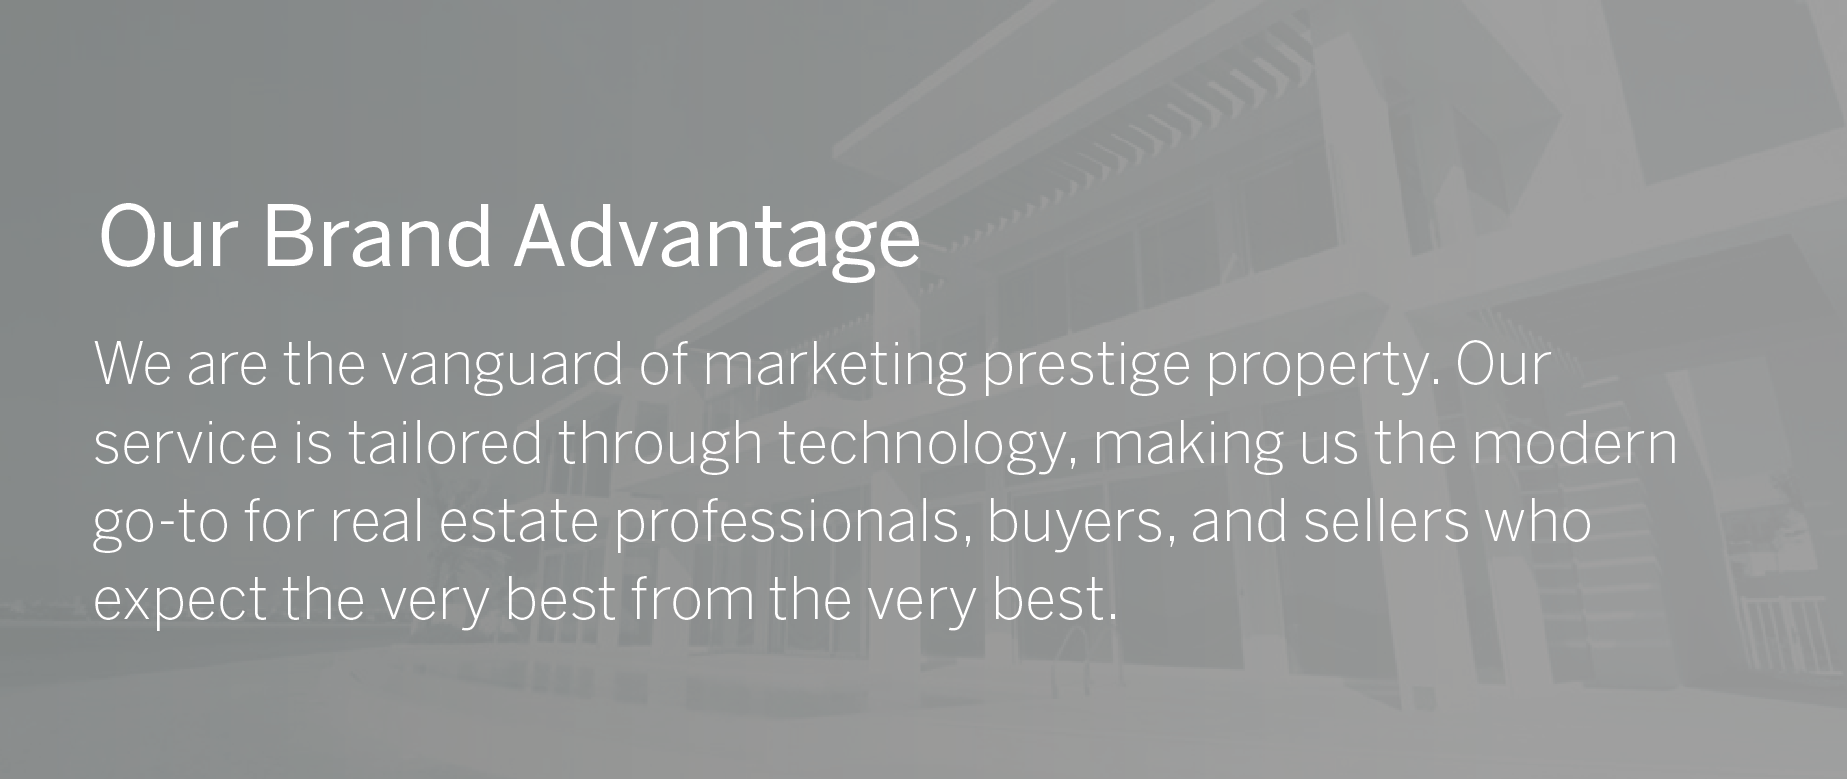 Brand Advantage